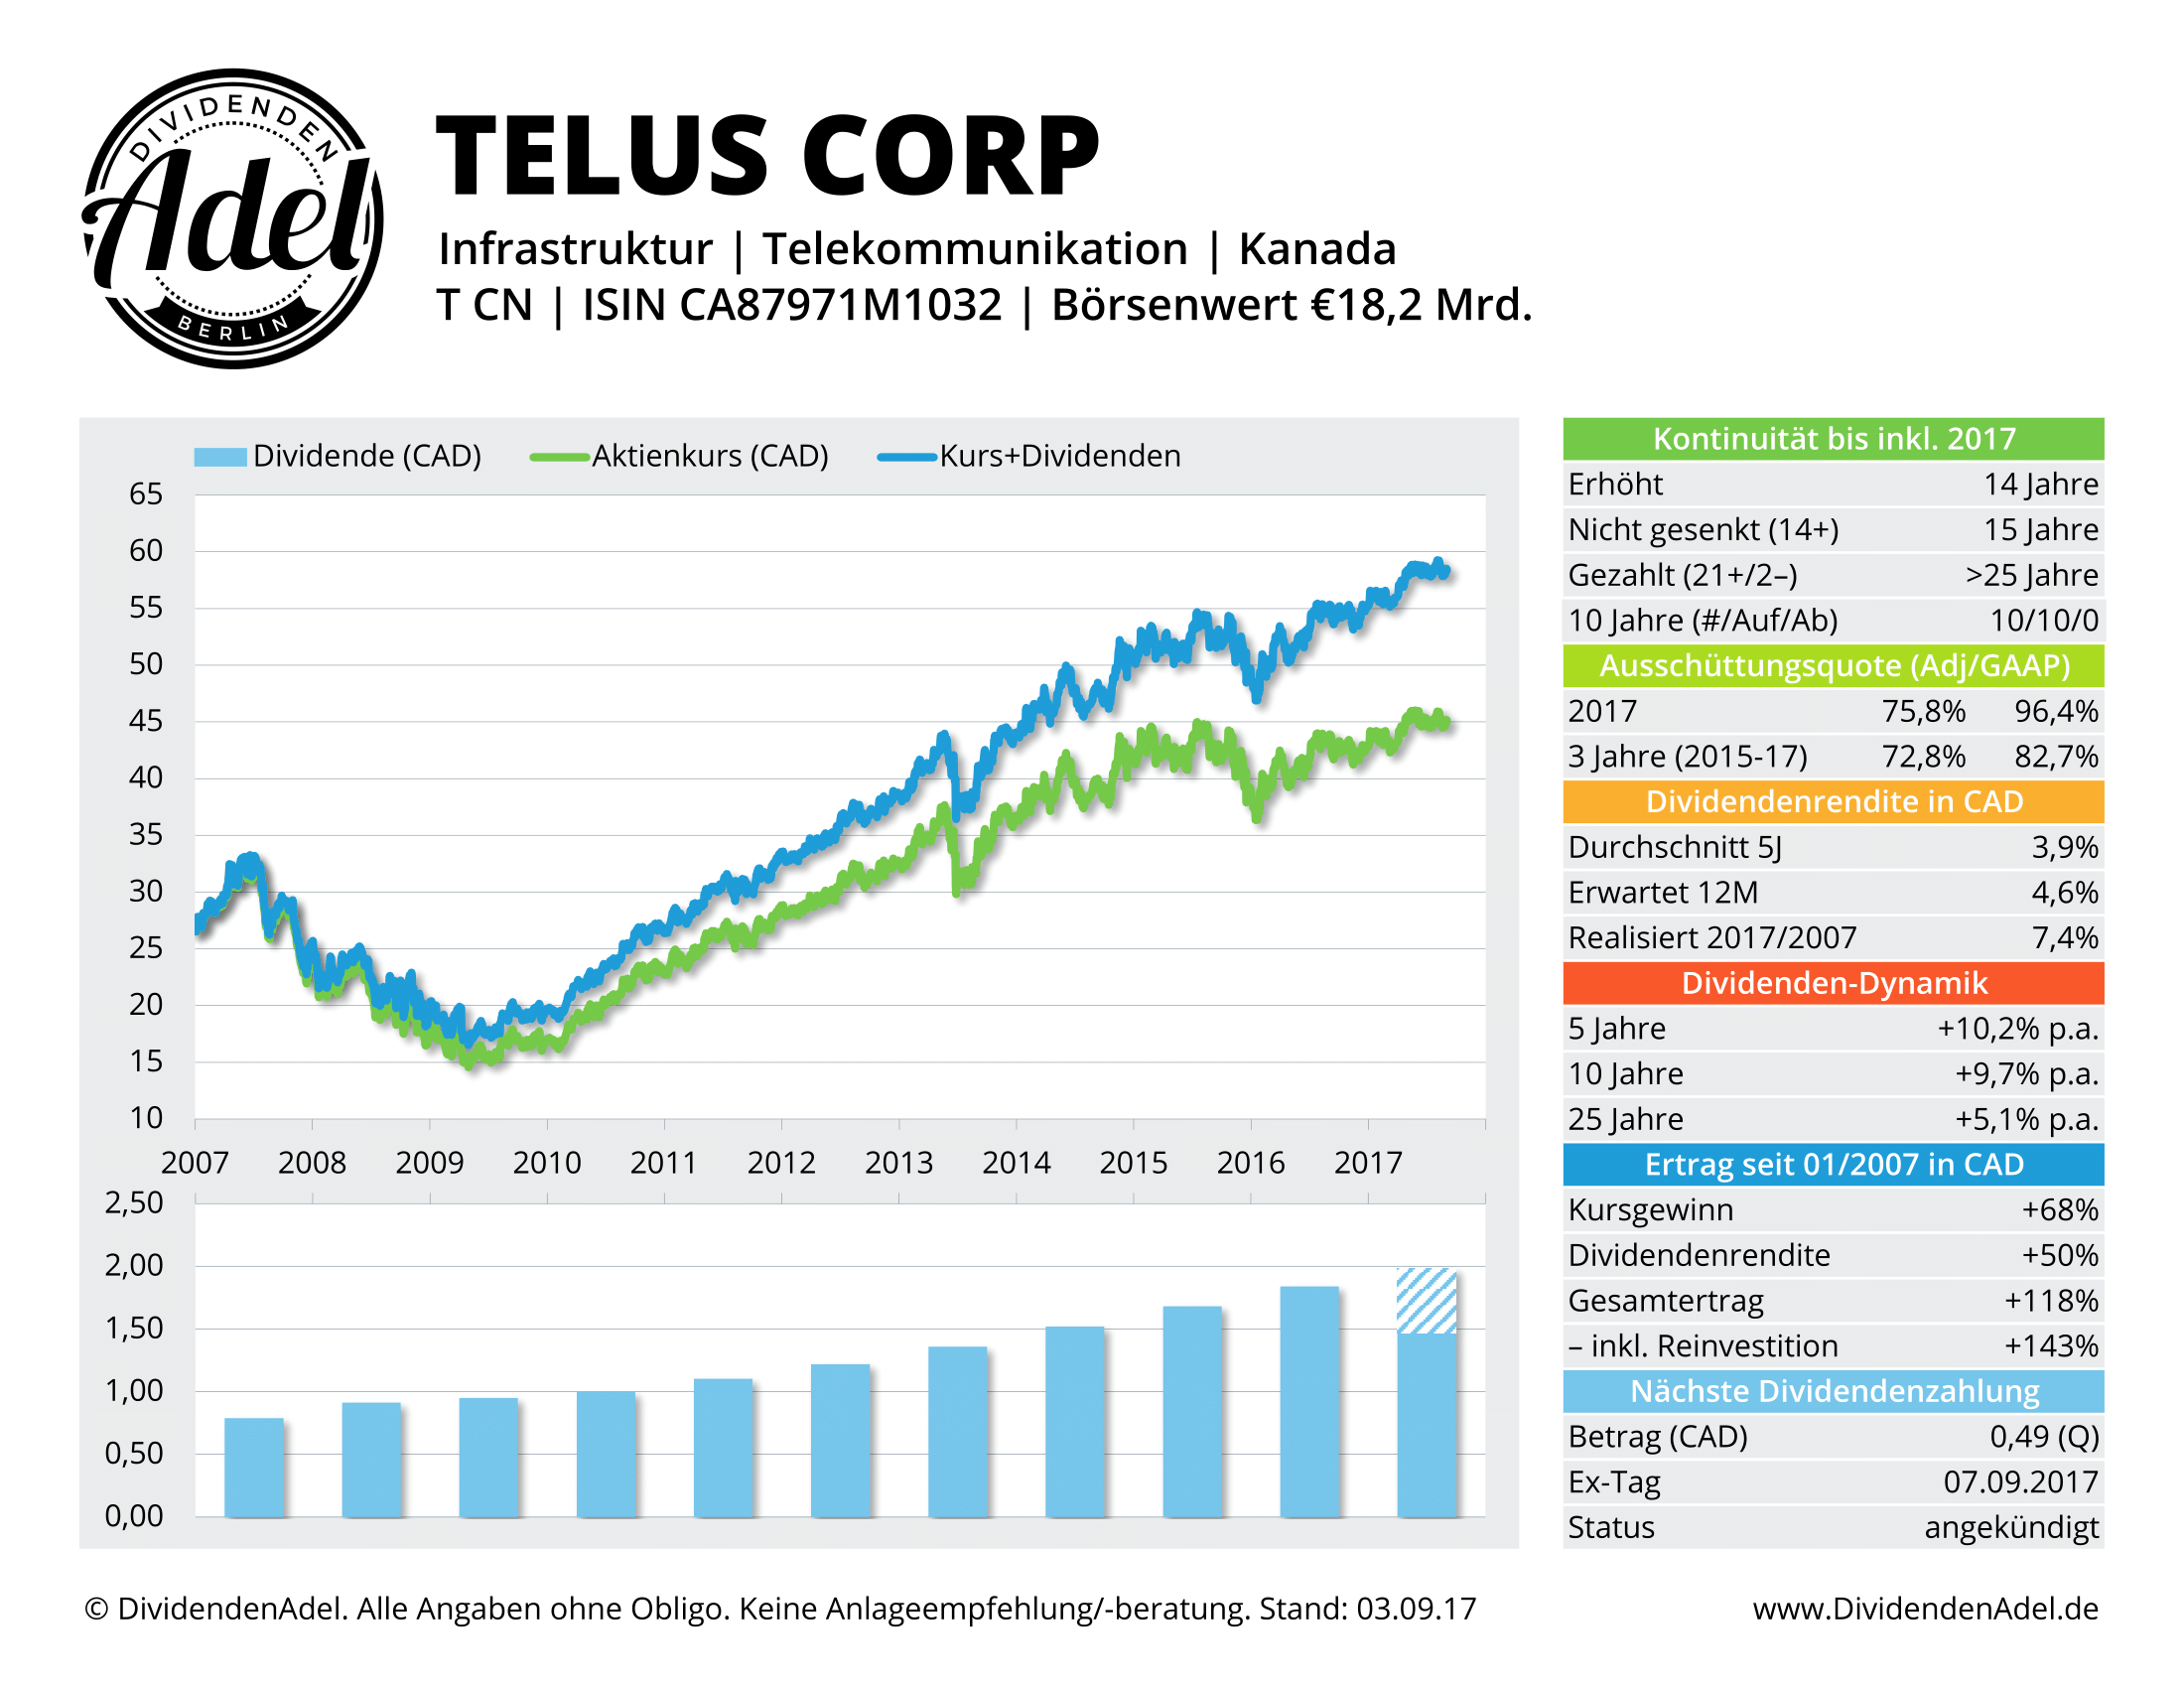 TELUS-CORP-DividendenAdel-Profil